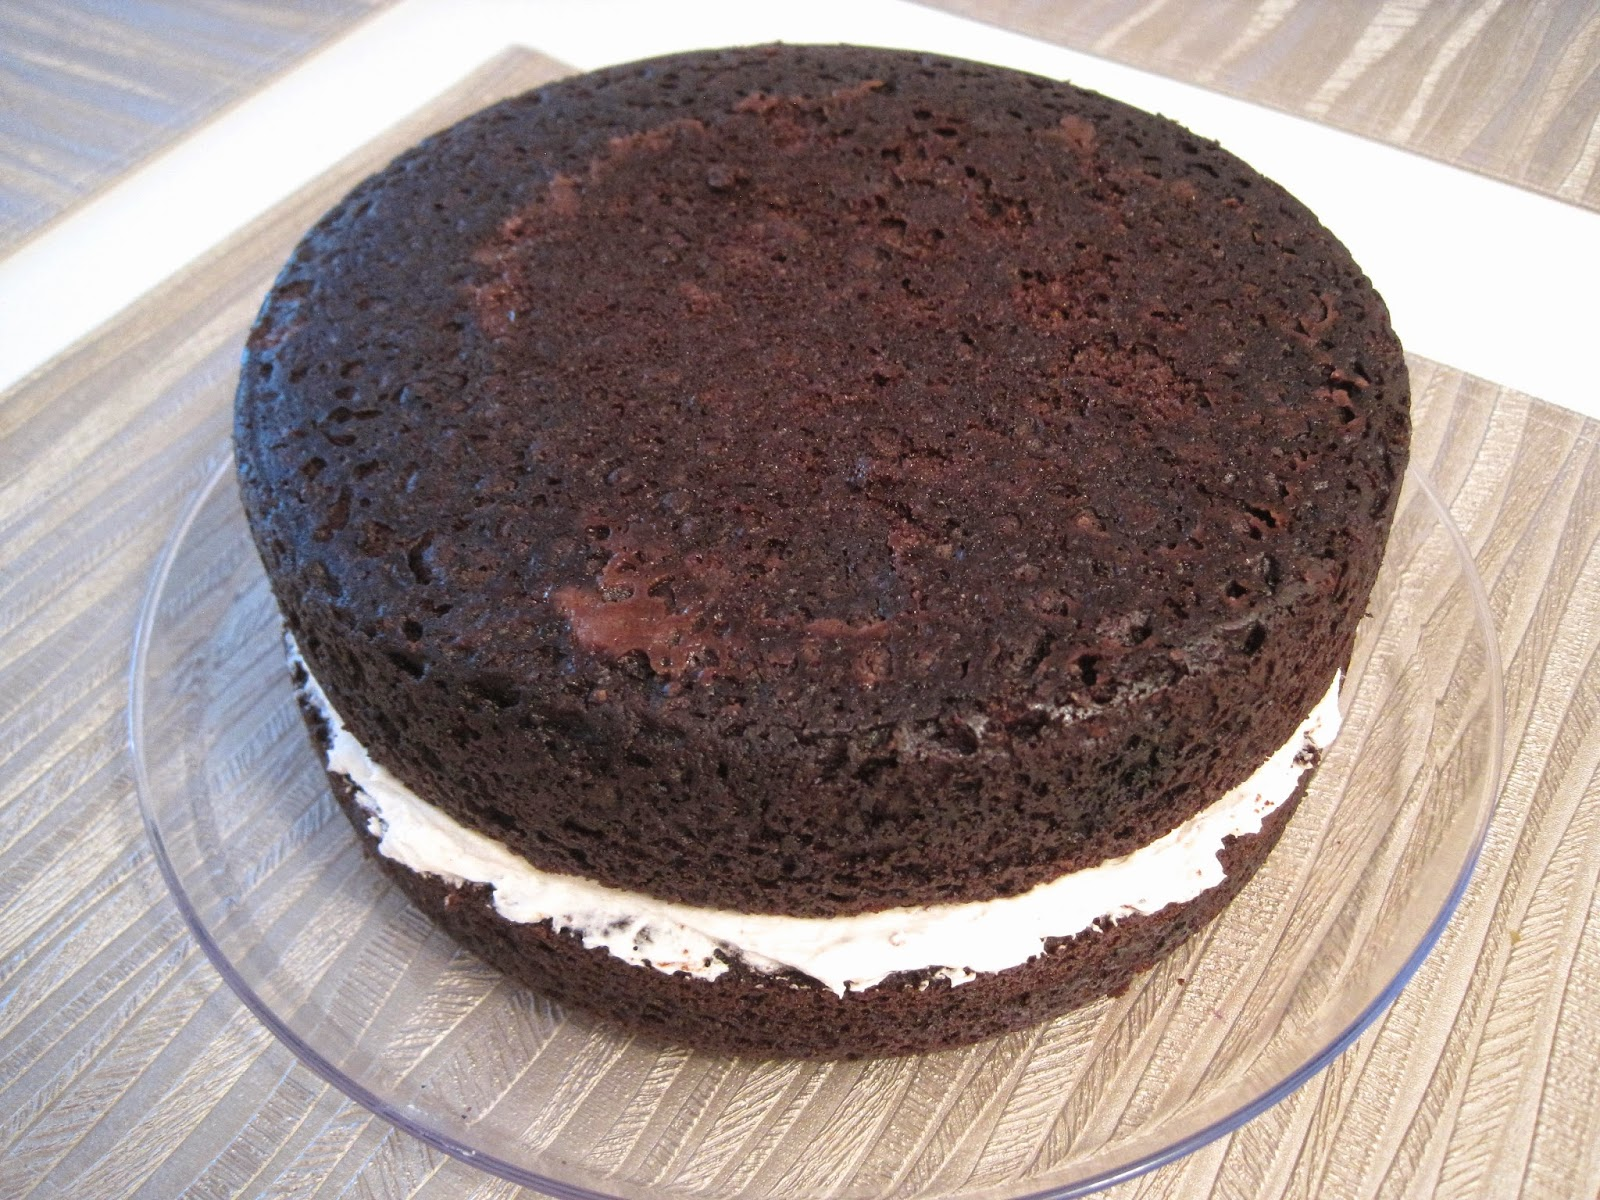 Gluten-Free Vegan Chocolate Cake with Vanilla Frosting Layer Veega Blog